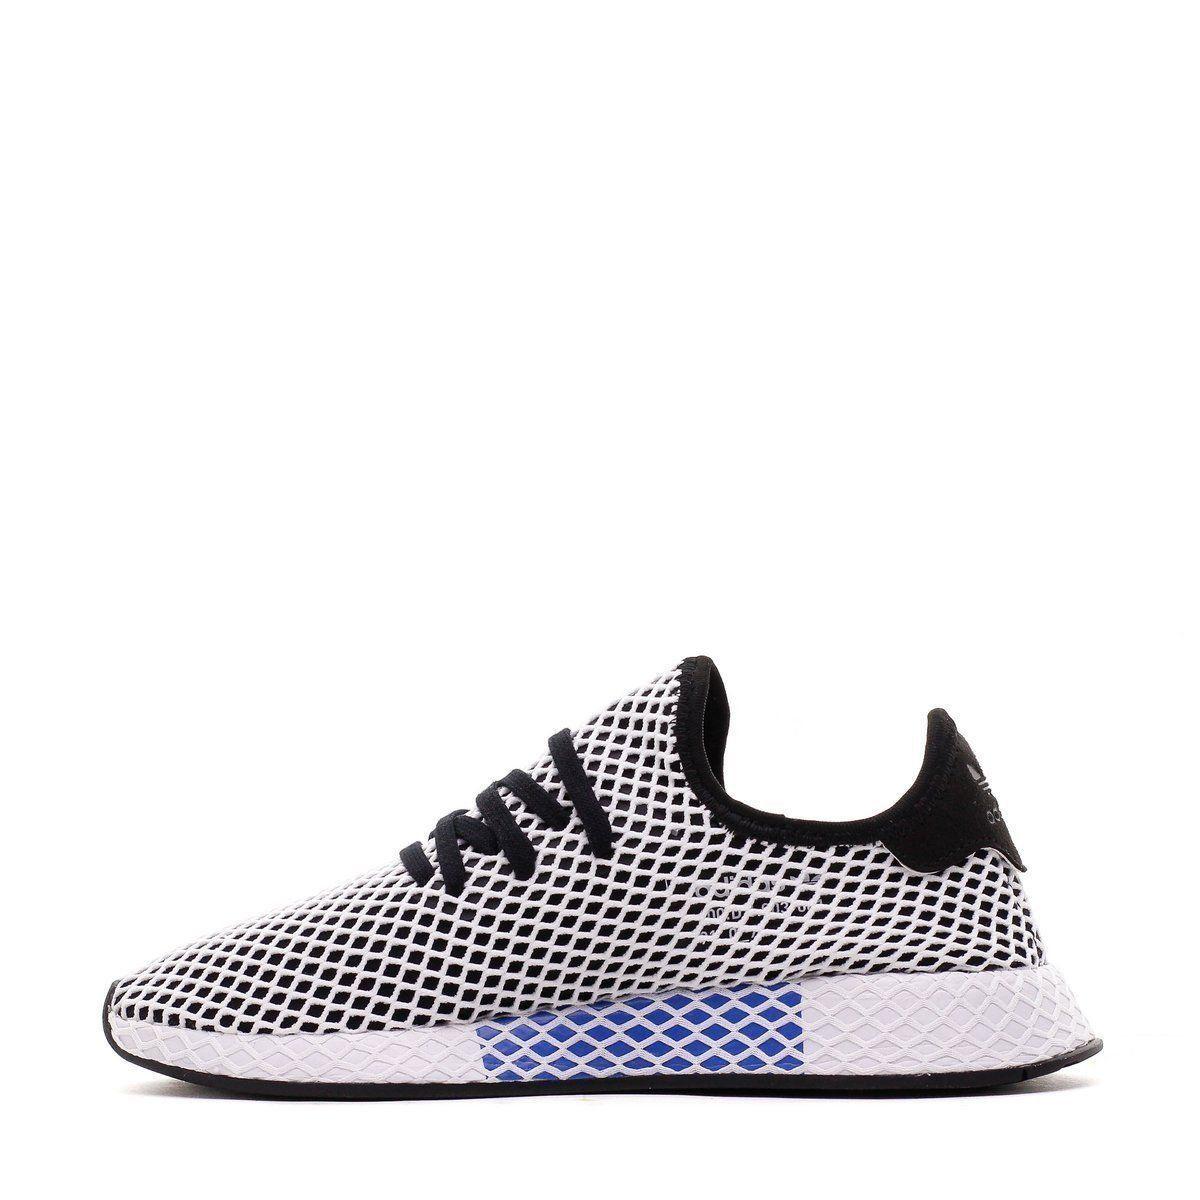 b6e2afcd6c223 Men Adidas Originals Deerupt Runner Core Black White CQ2626 ...